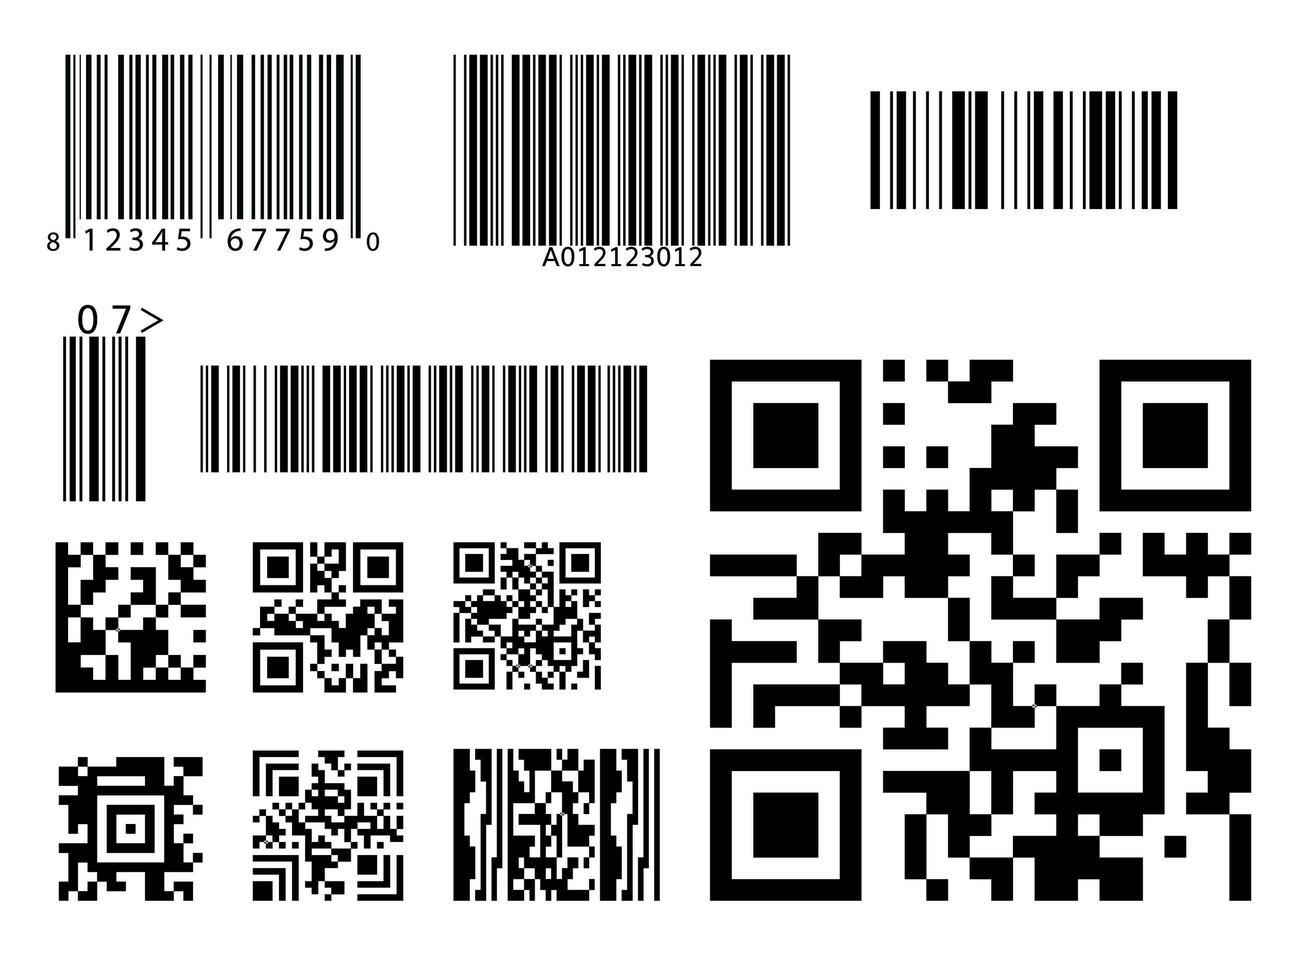 conjunto de símbolos de código de código de barras qr vector